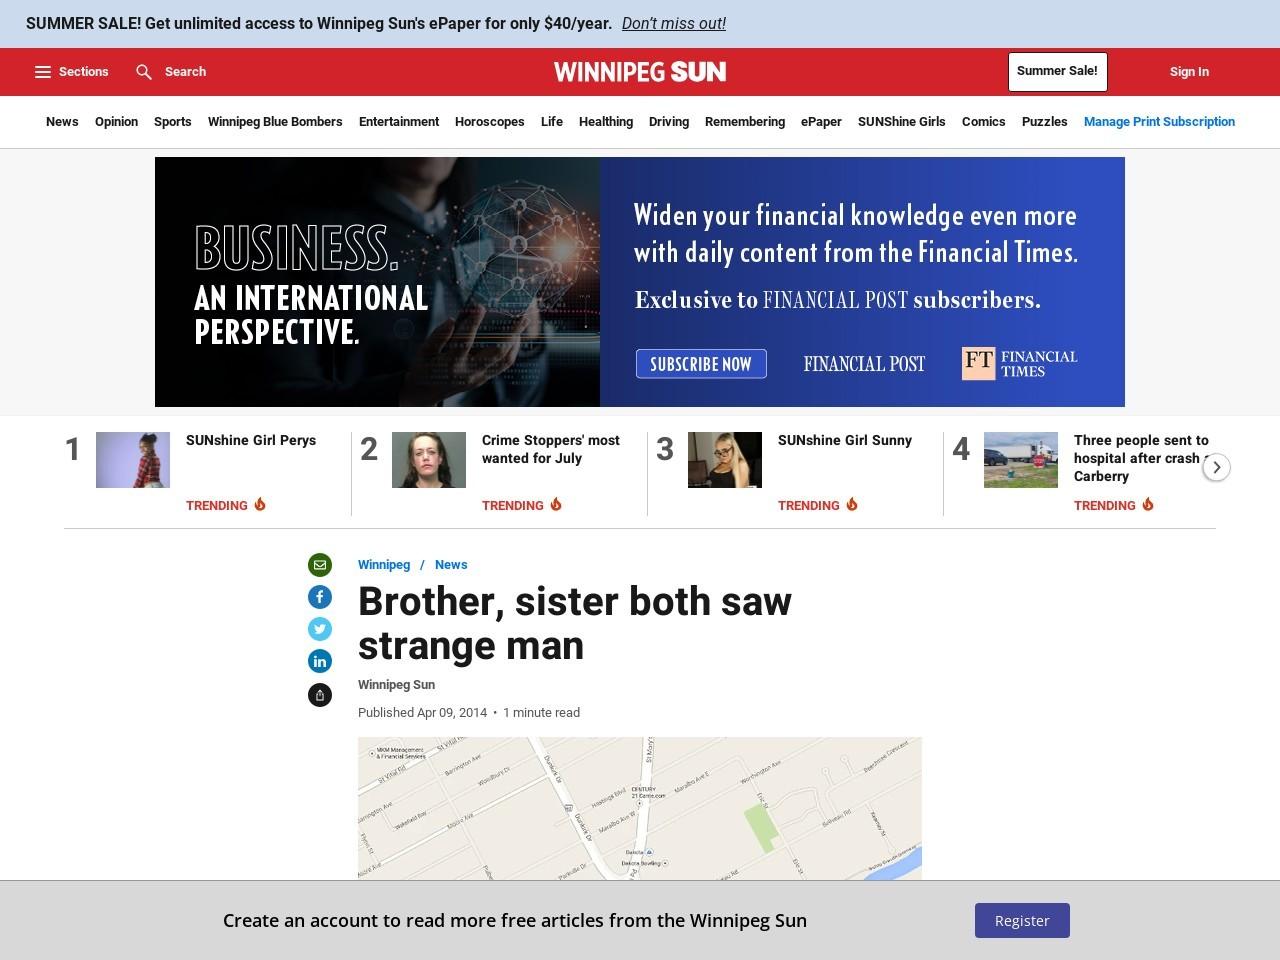 Brother, sister both saw strange man | Winnipeg | News | Winnipeg …